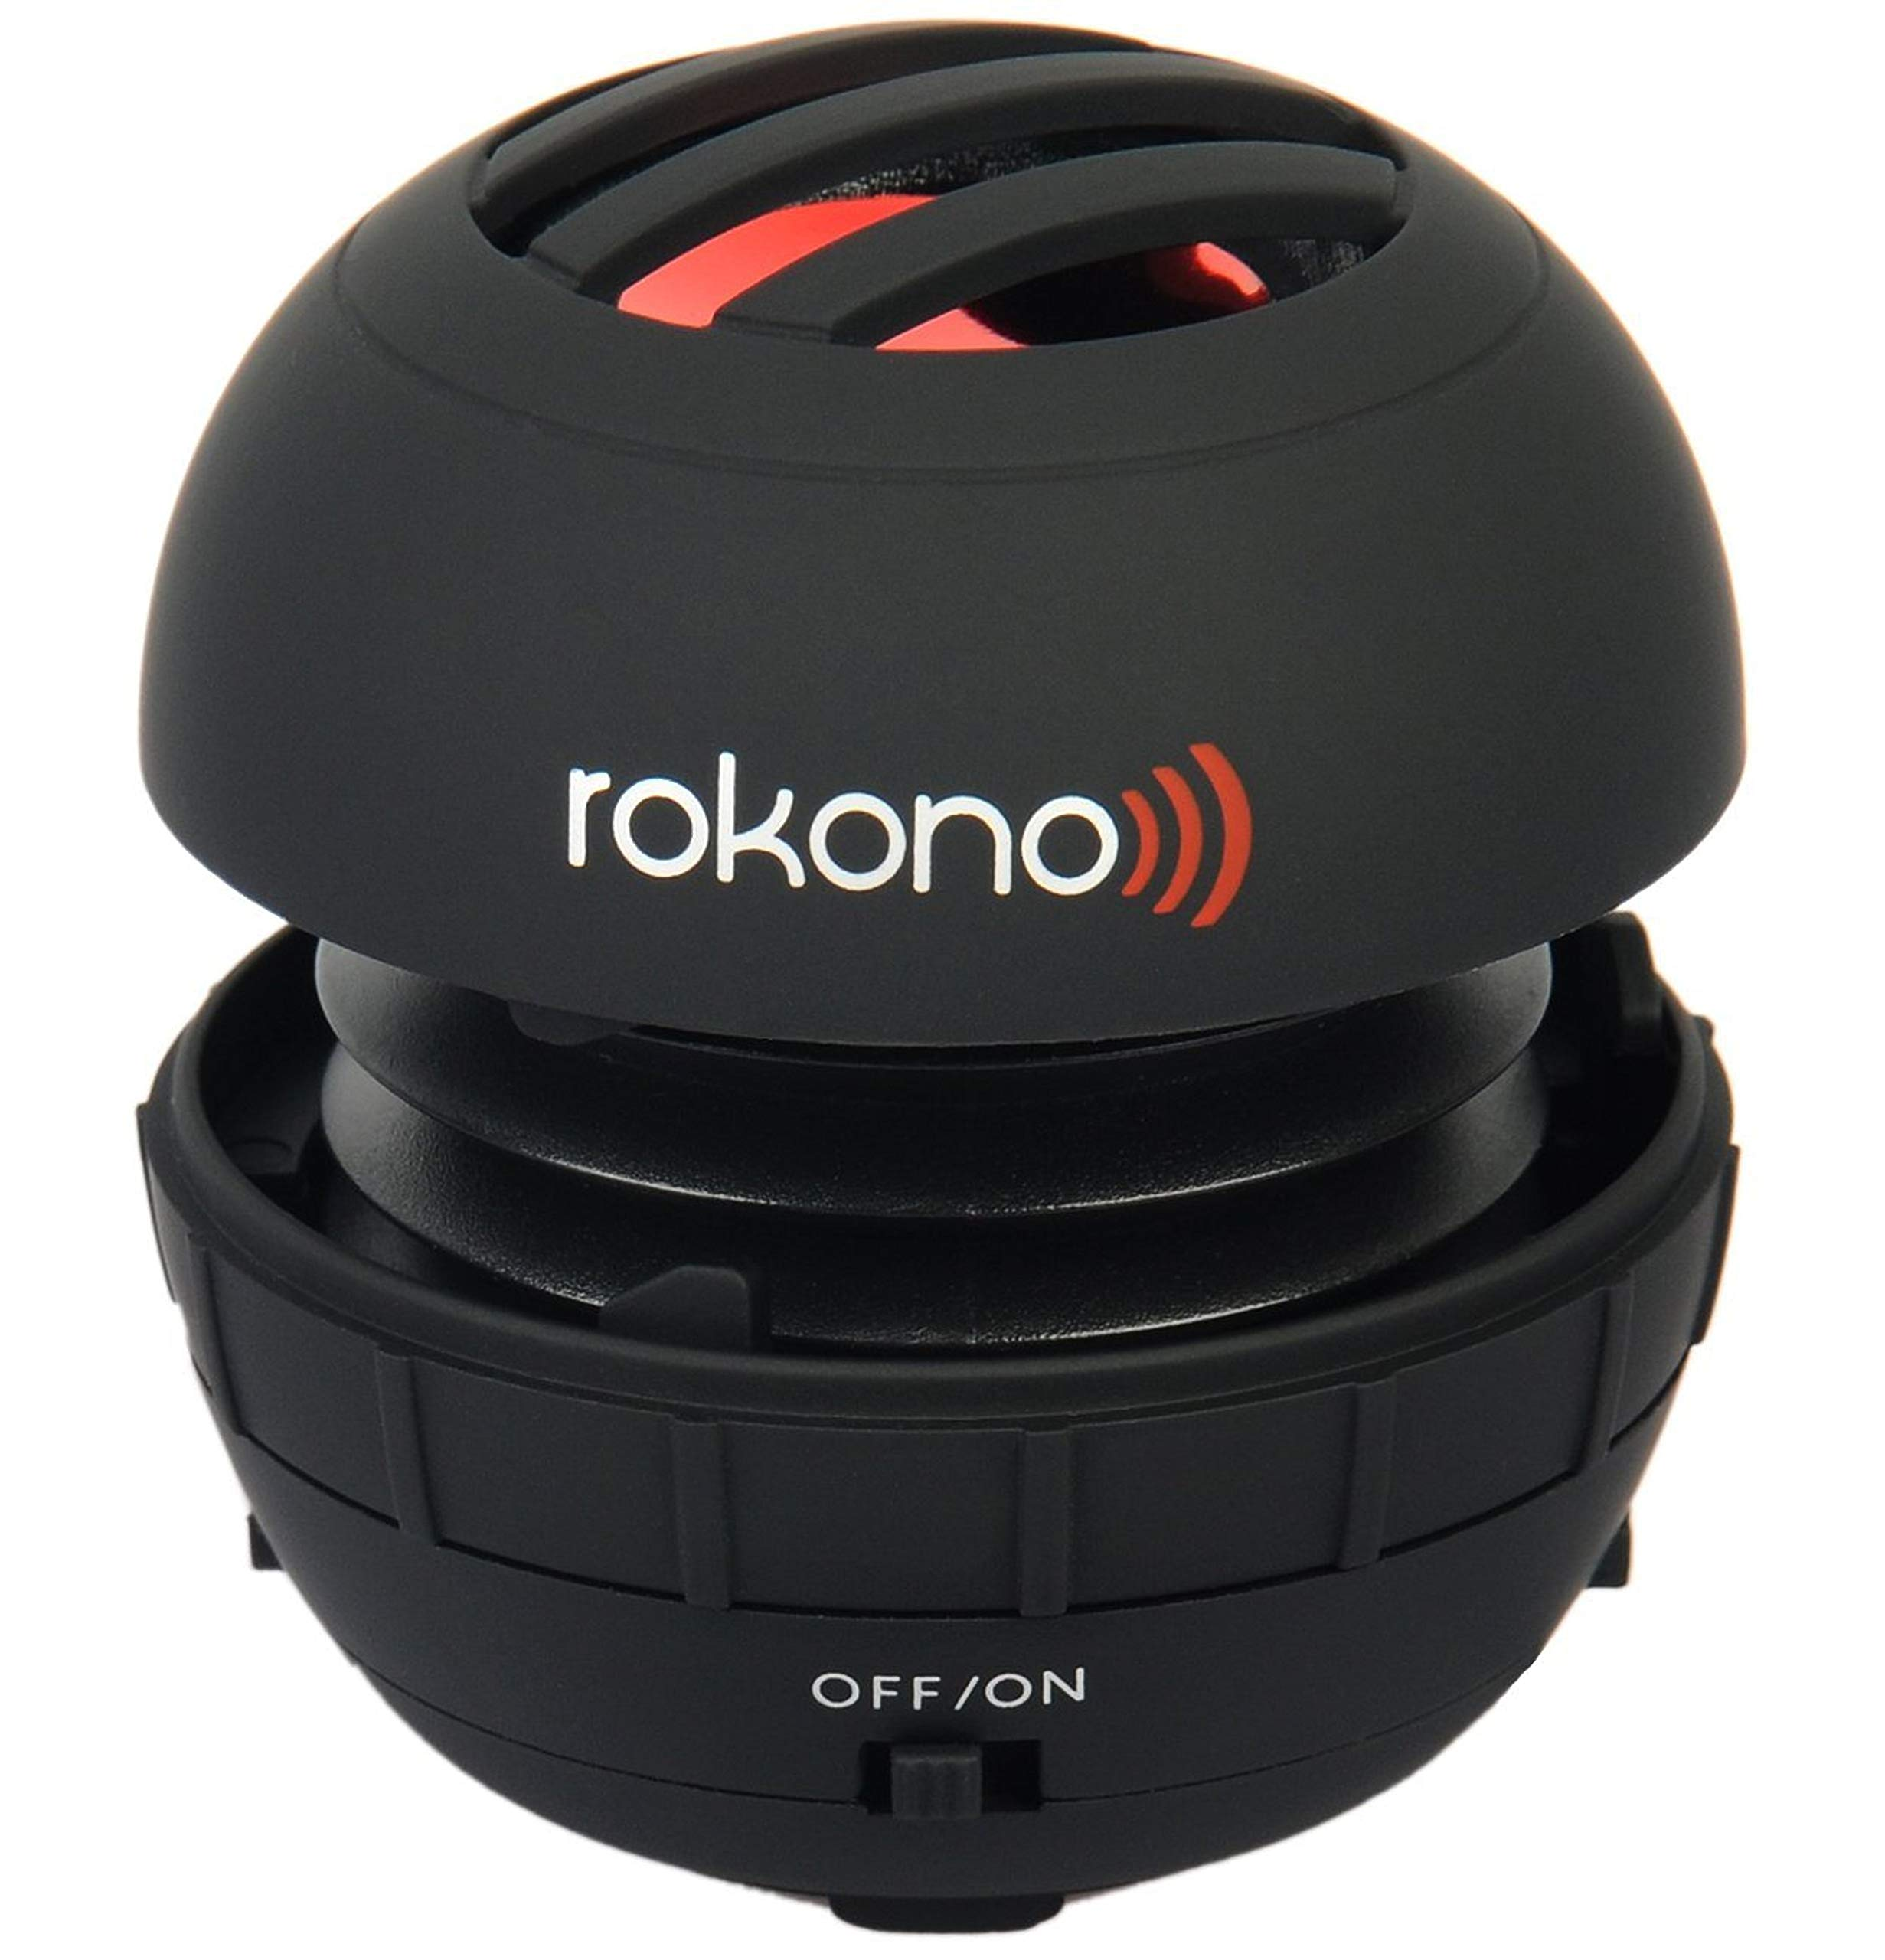 Rokono BASS+ Mini Speaker for iPhone / iPad / iPod / MP3 Player / Laptop - Black by Rokono